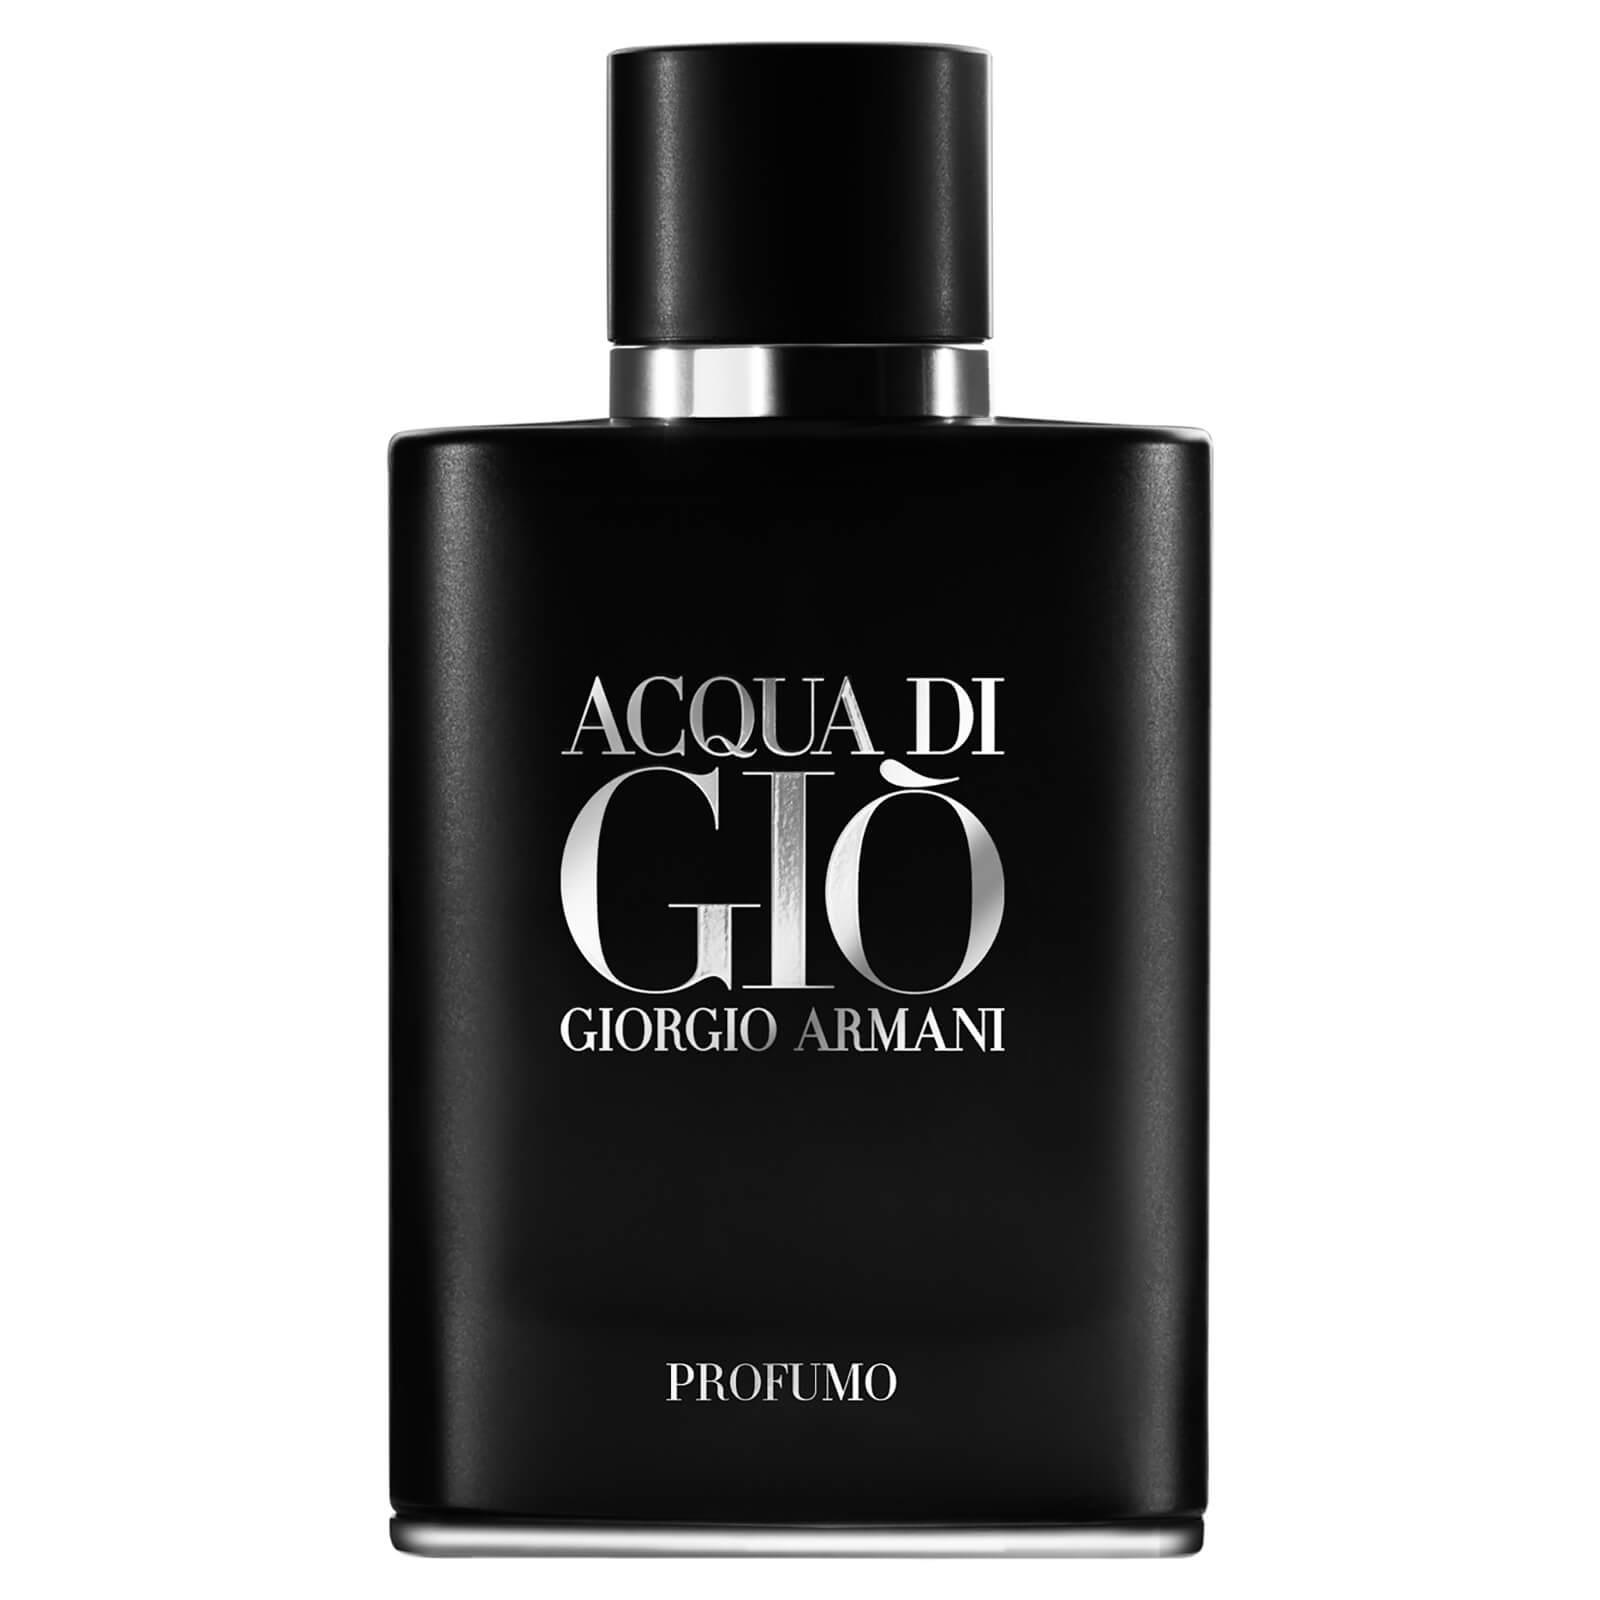 Giorgio Armani Acqua Di Gio Profumo Eau de Parfum - 75ml